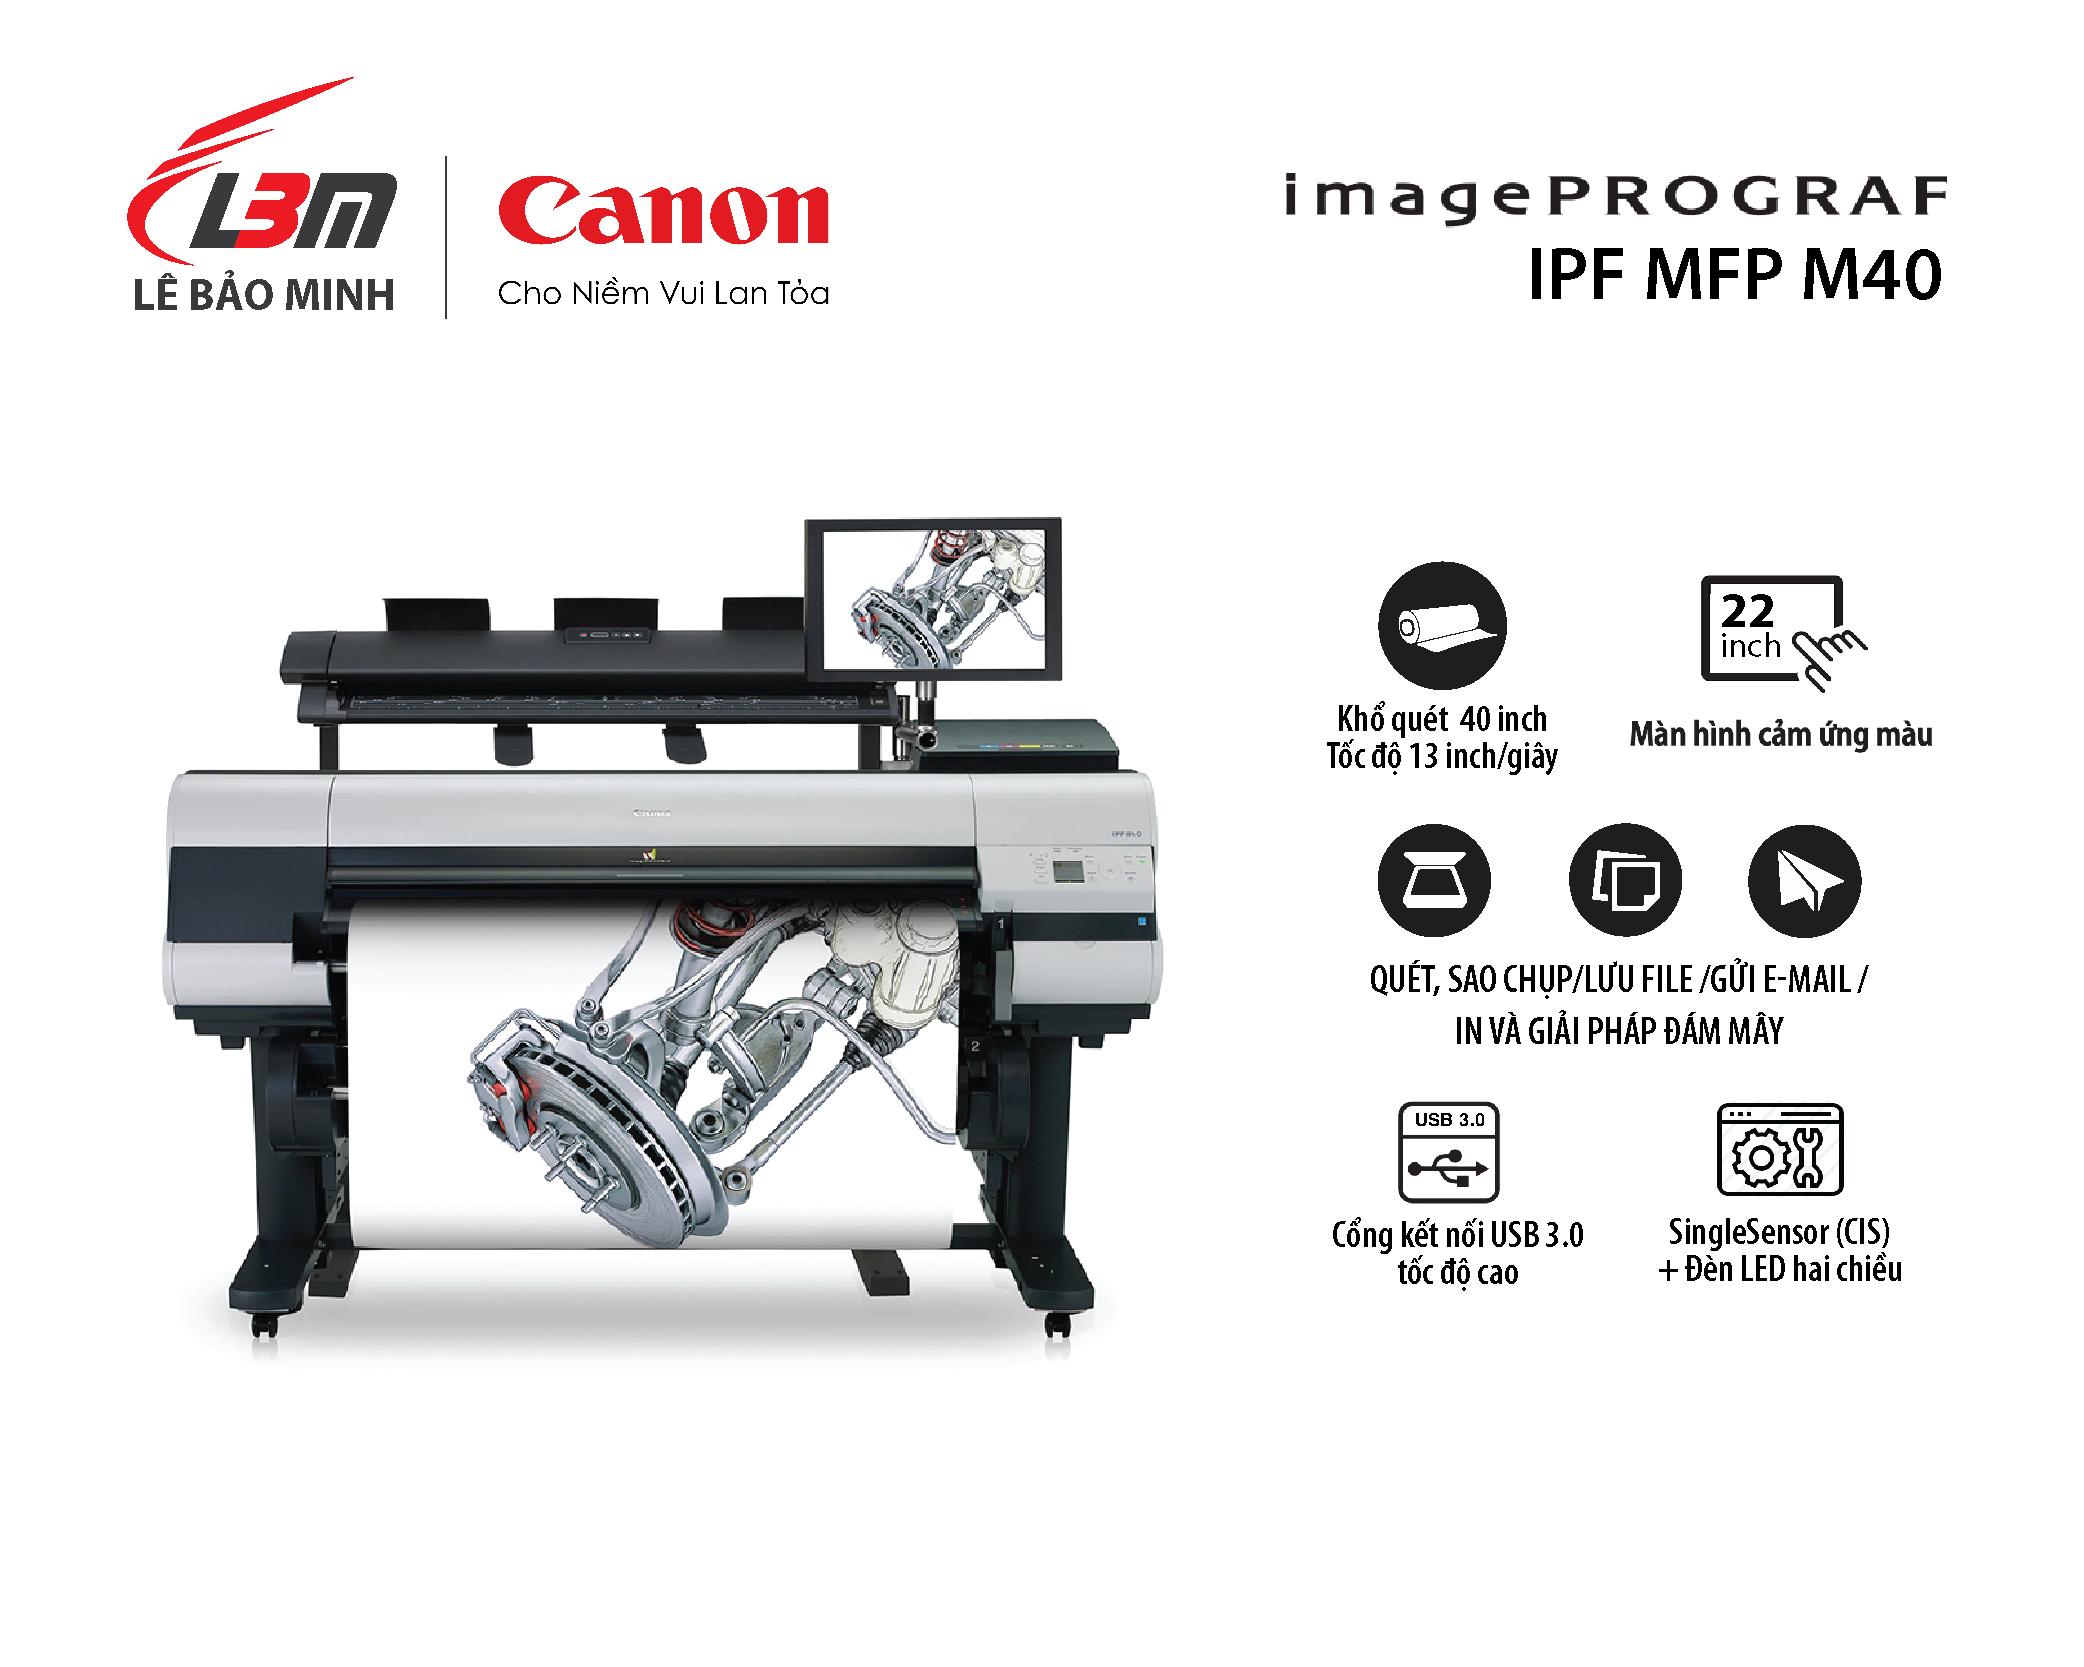 imagePROGRAF iPF MFP M40